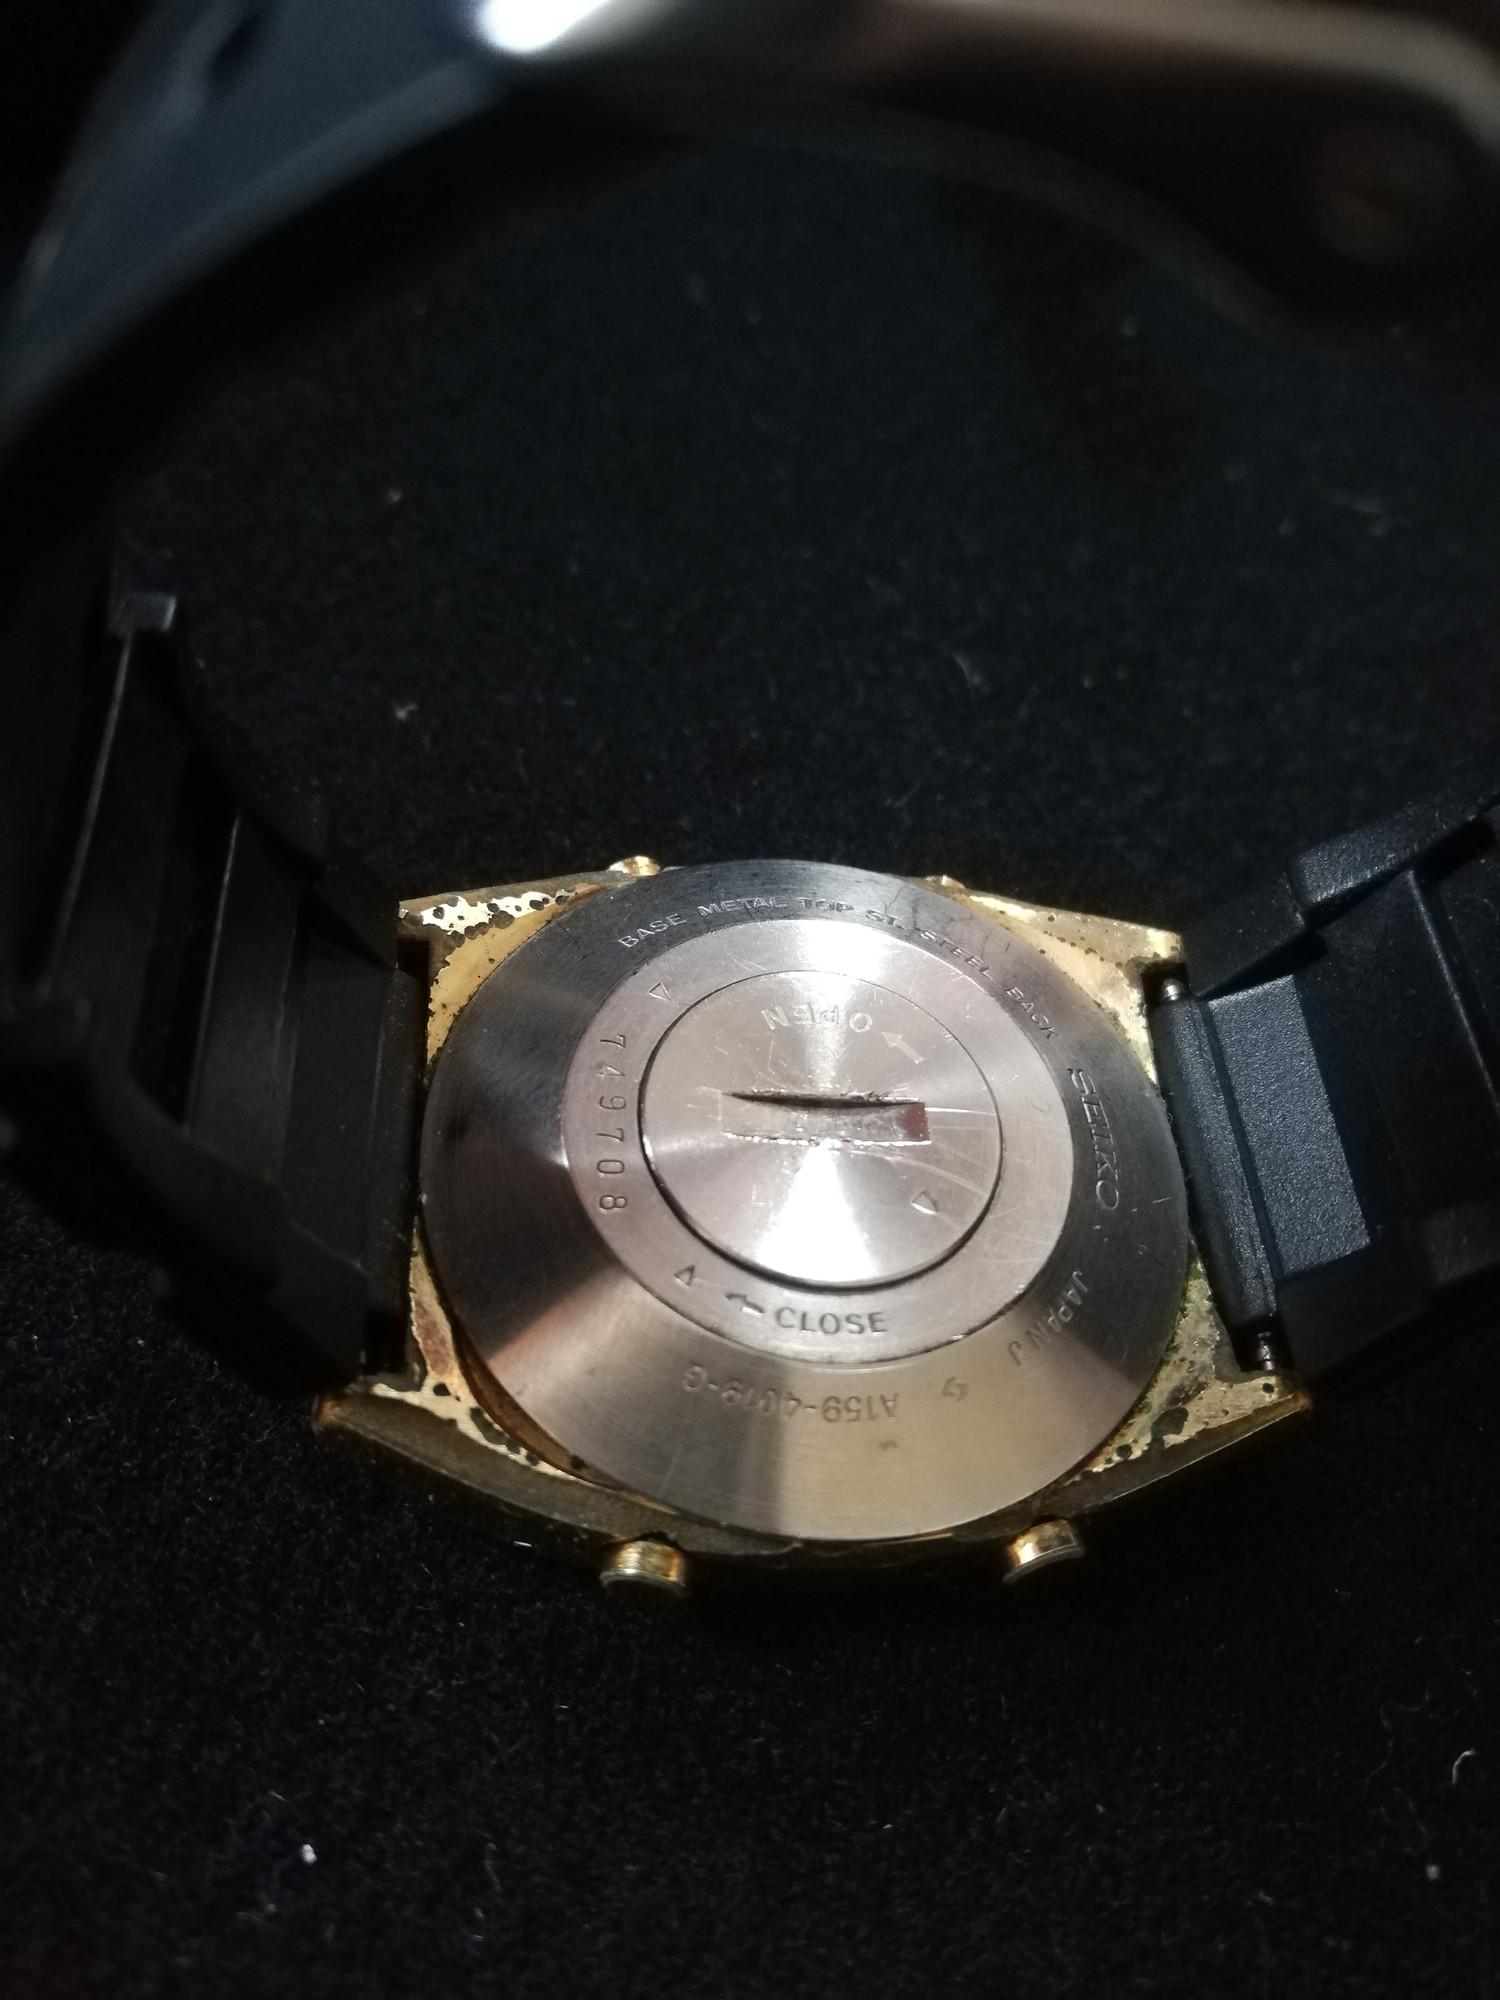 Seiko quartz LC wristwatch on rubber strap in original box - Image 3 of 3